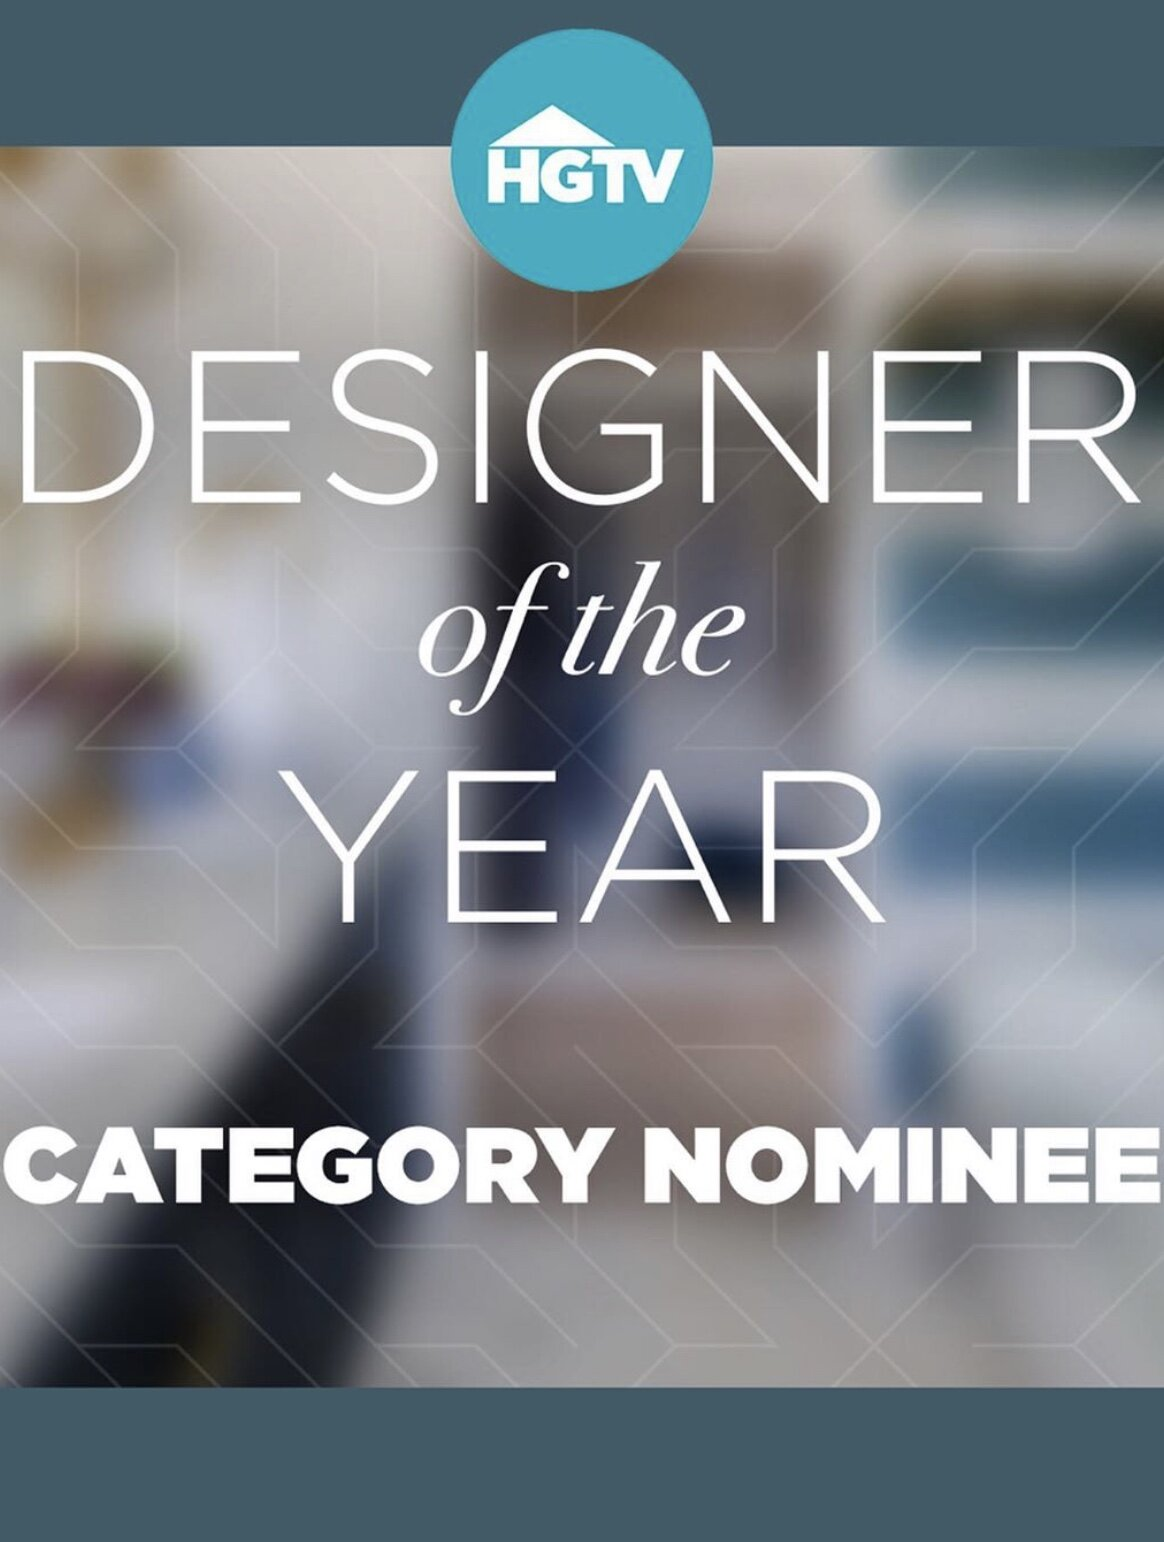 HGTV Designer of the Year